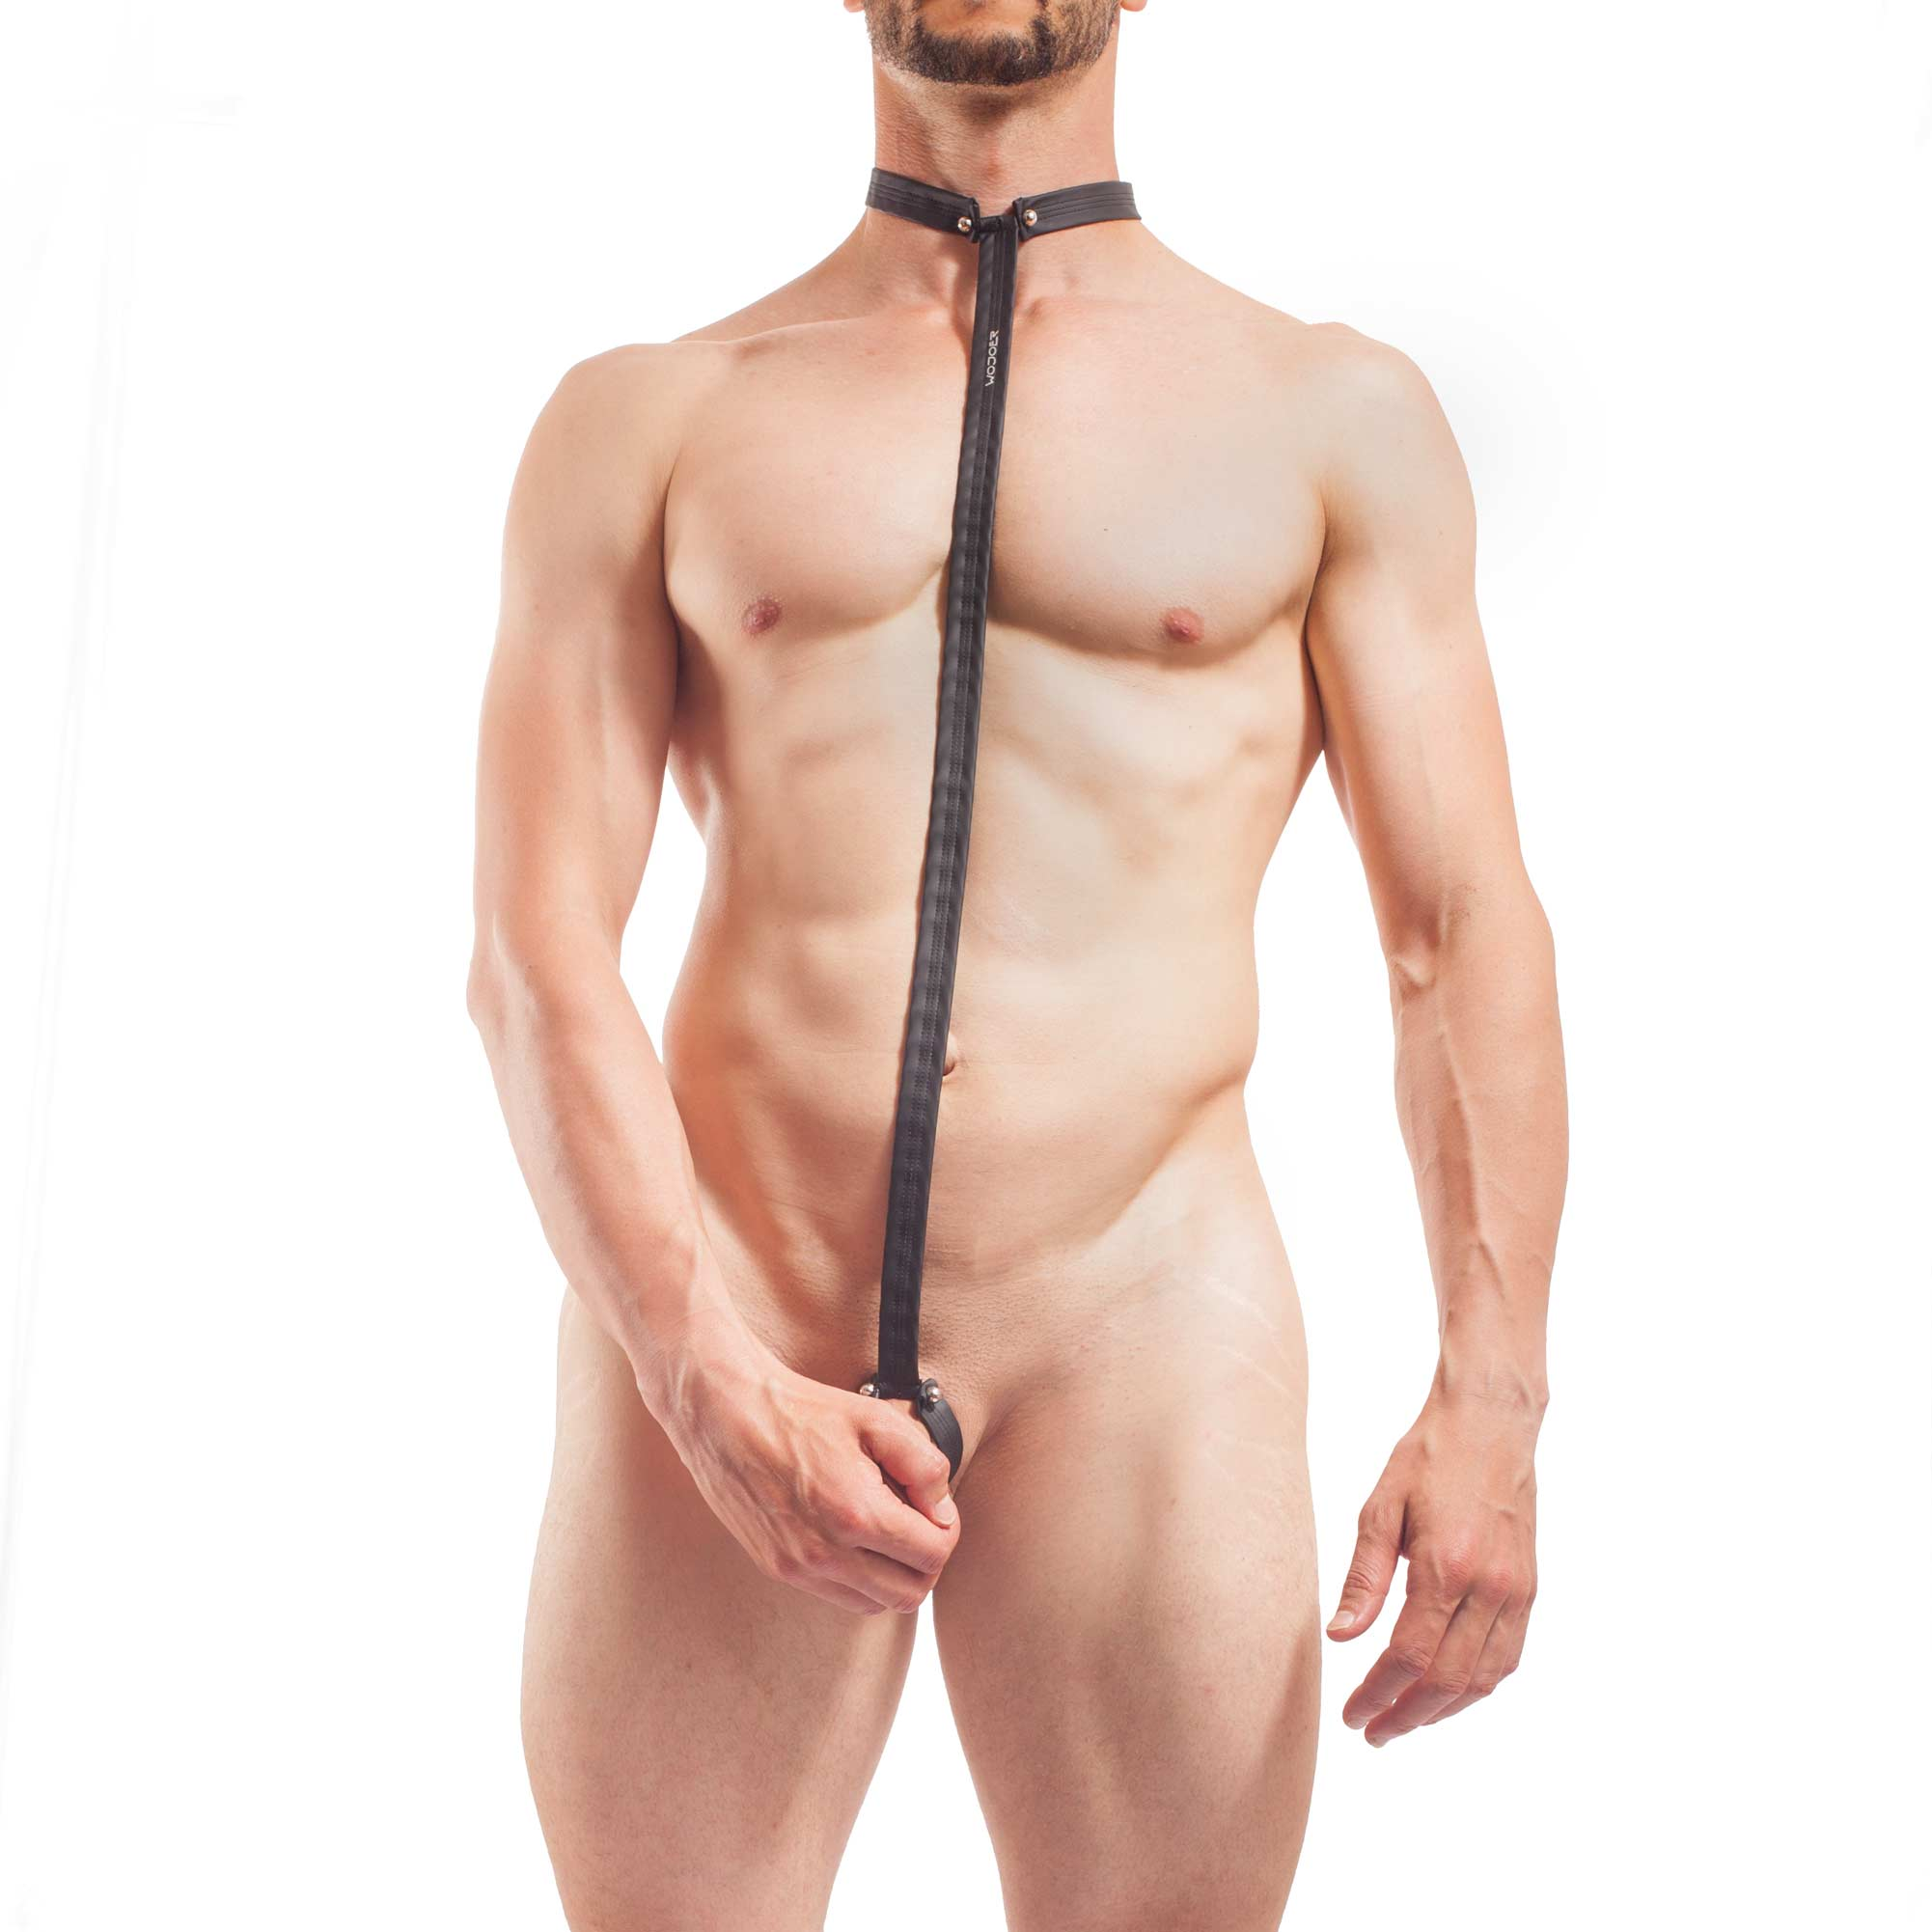 Piercing Body Set, mattes Leder, Synlex, schwarz, Leatherlike, BTR, Bauchband, Halsband